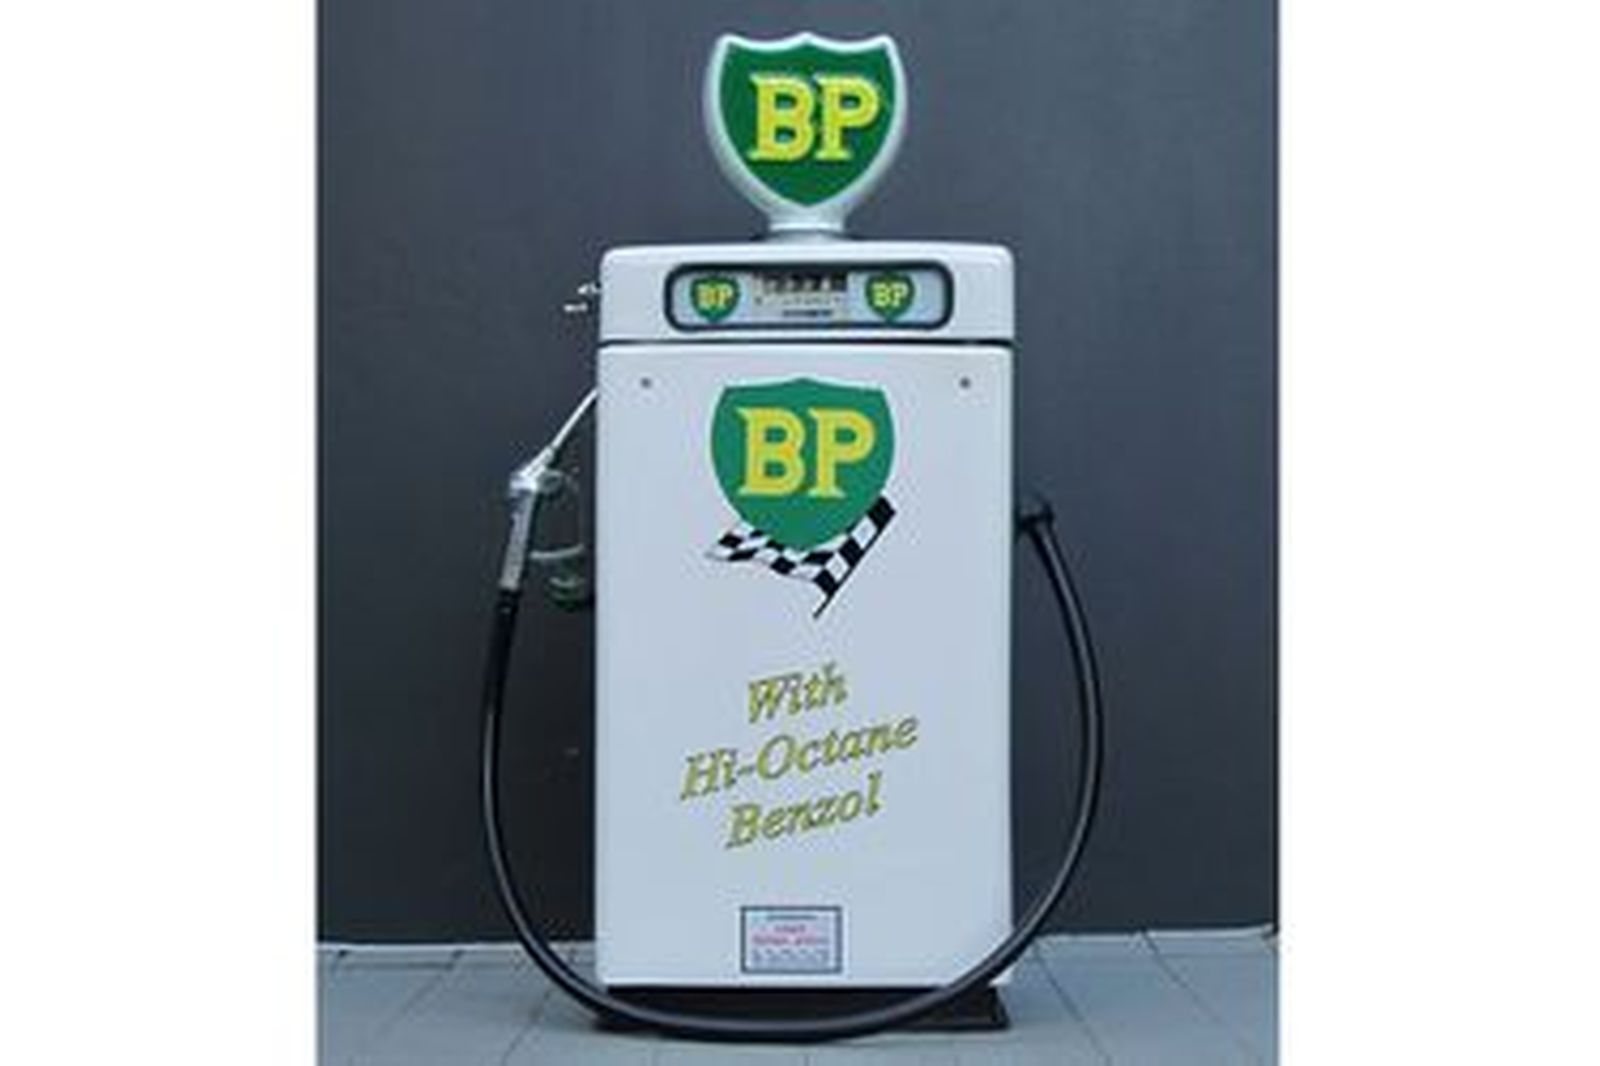 petrol pump wayne 605 electric in bp racing livery restored with globe